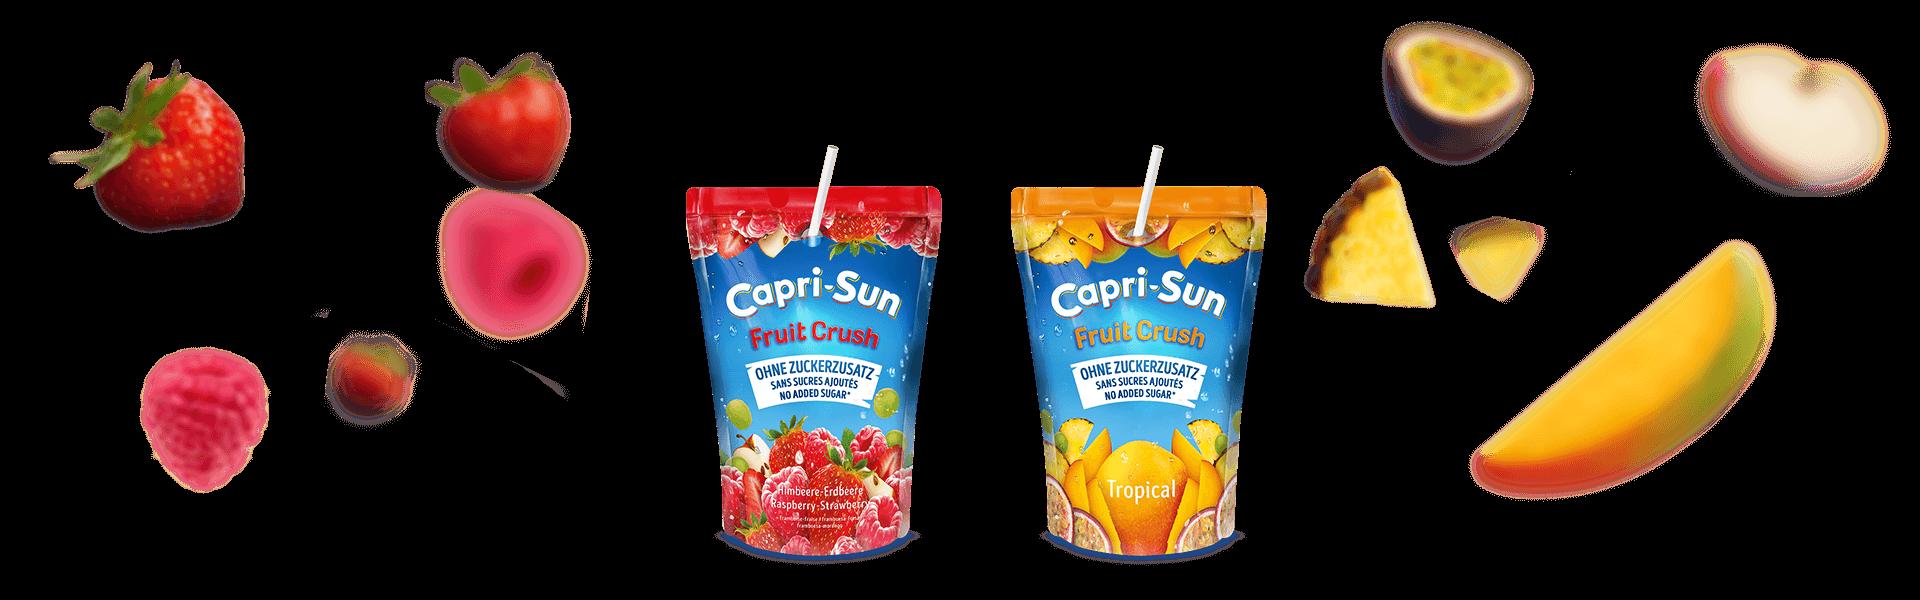 Capri-Sun Website Header Pure